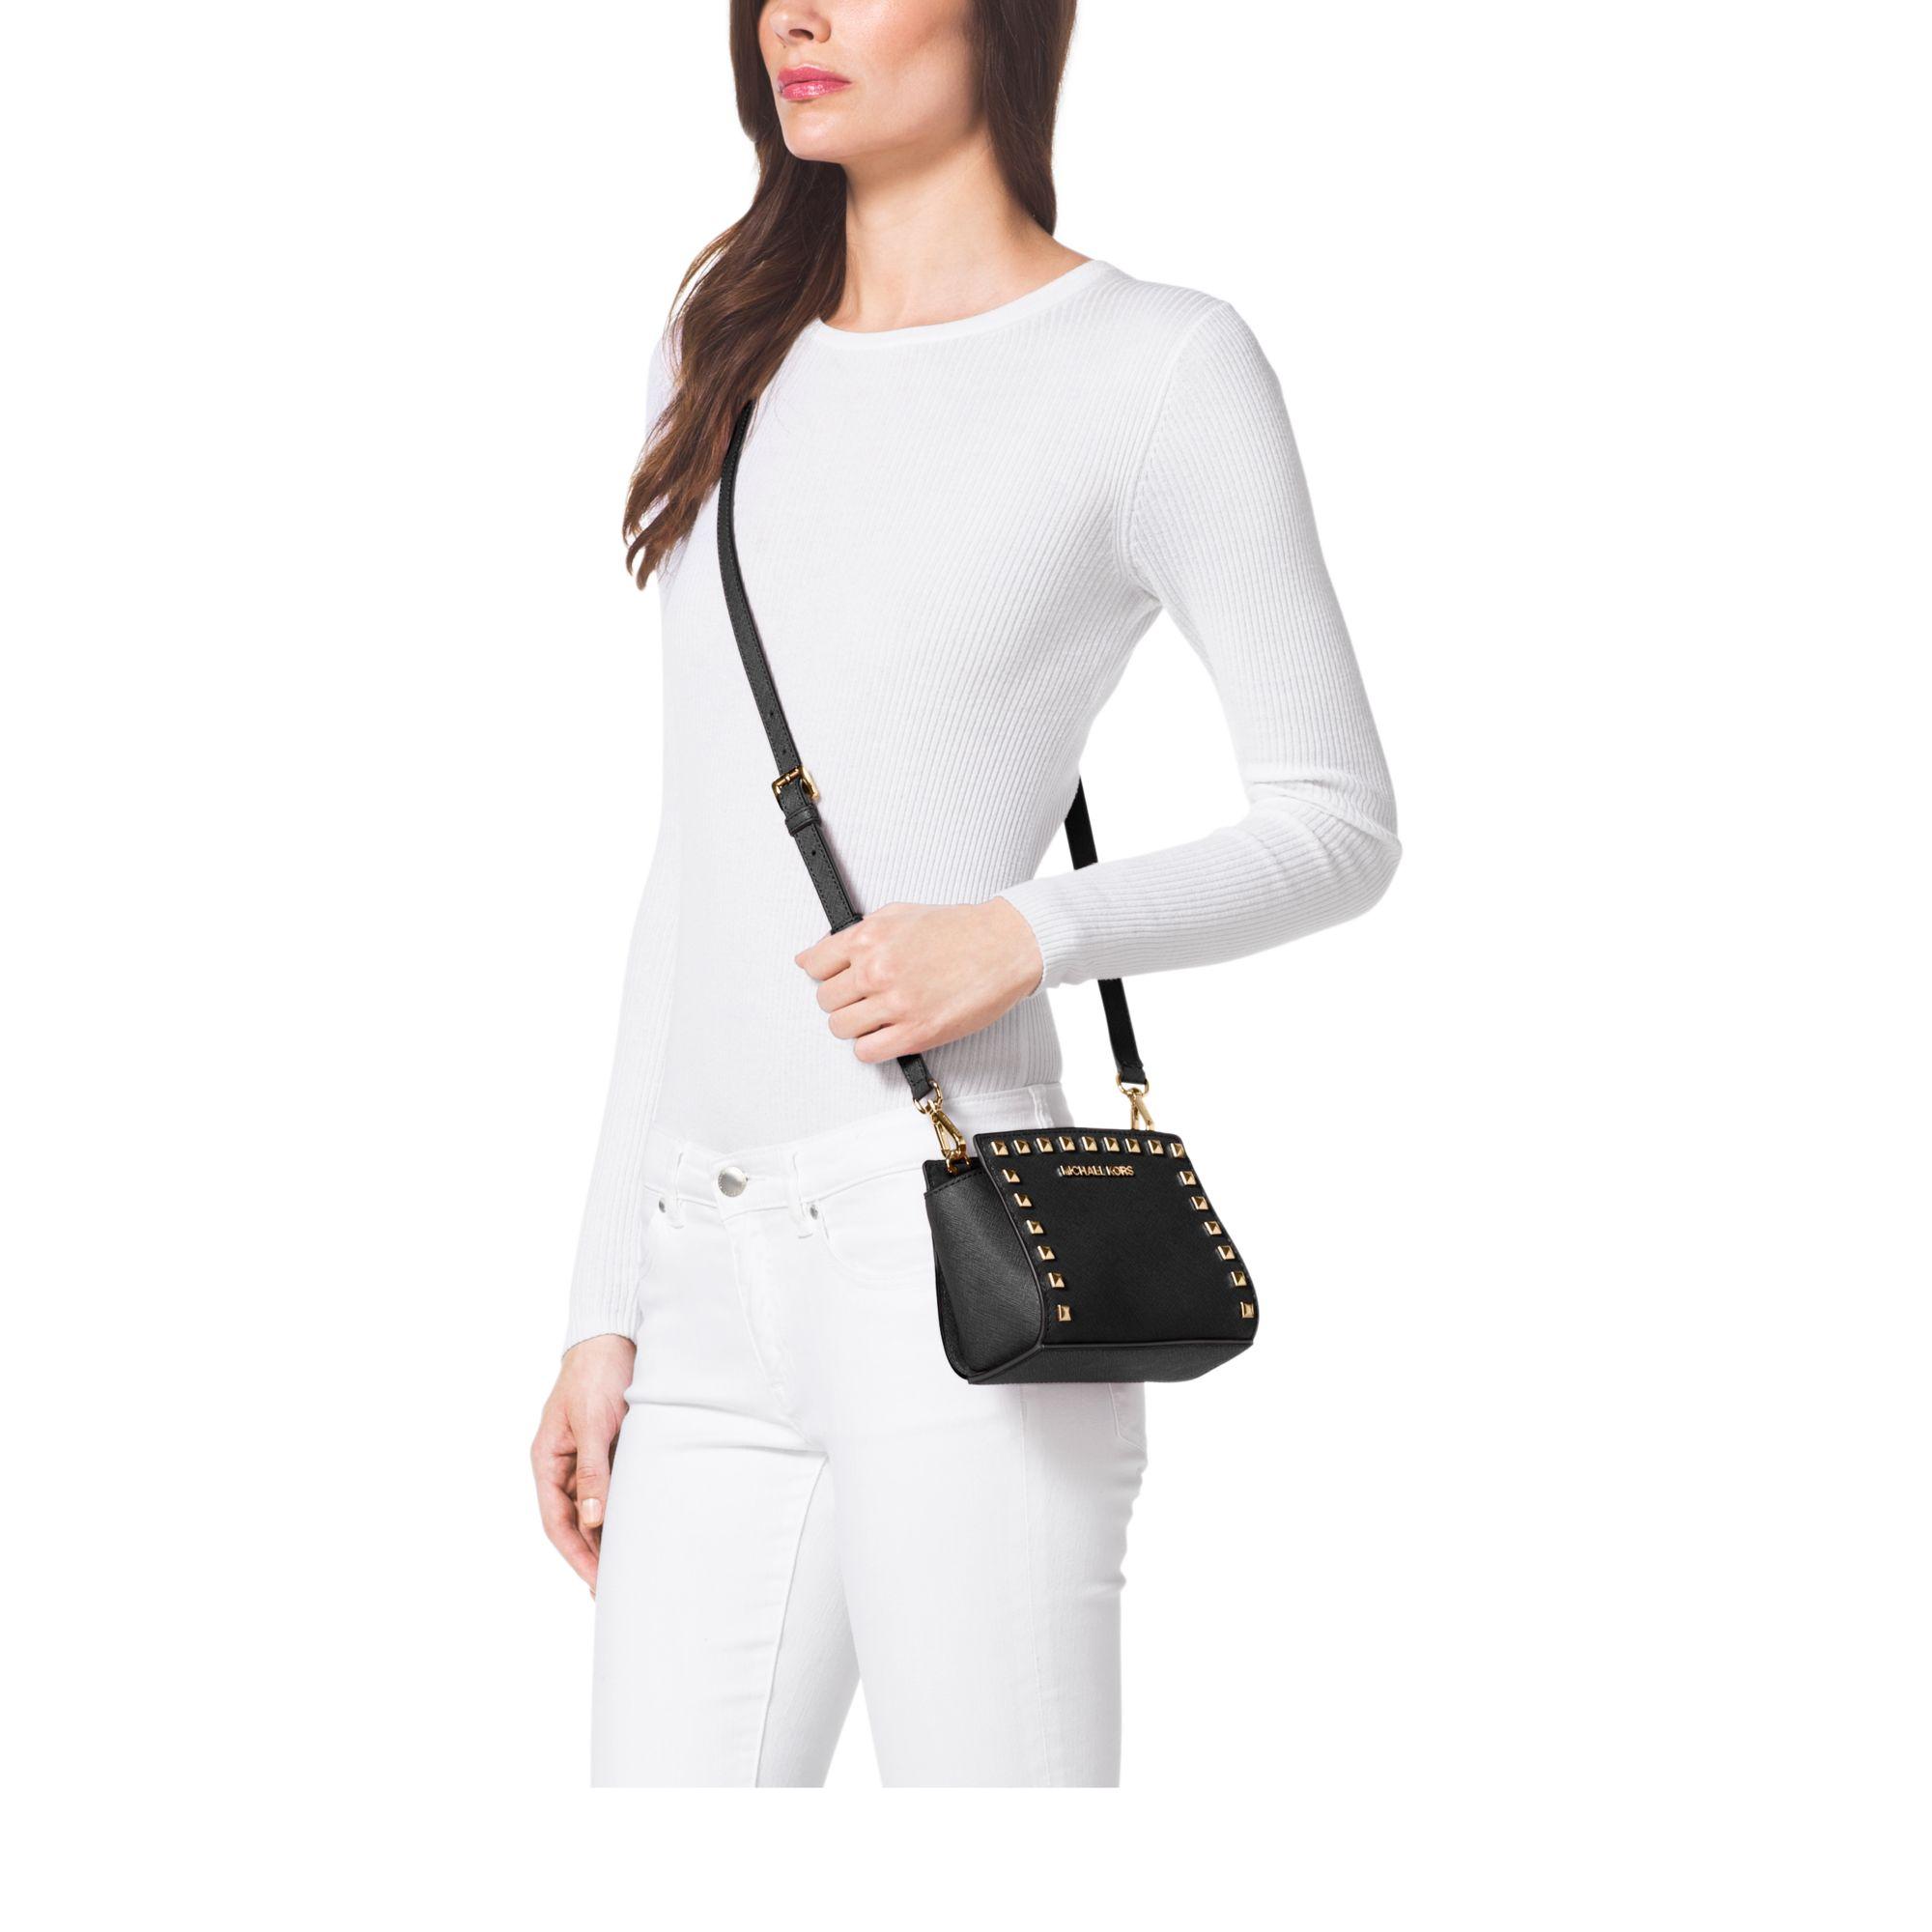 1625499c6b Lyst - Michael Kors Selma Mini Studded Leather Crossbody in Black